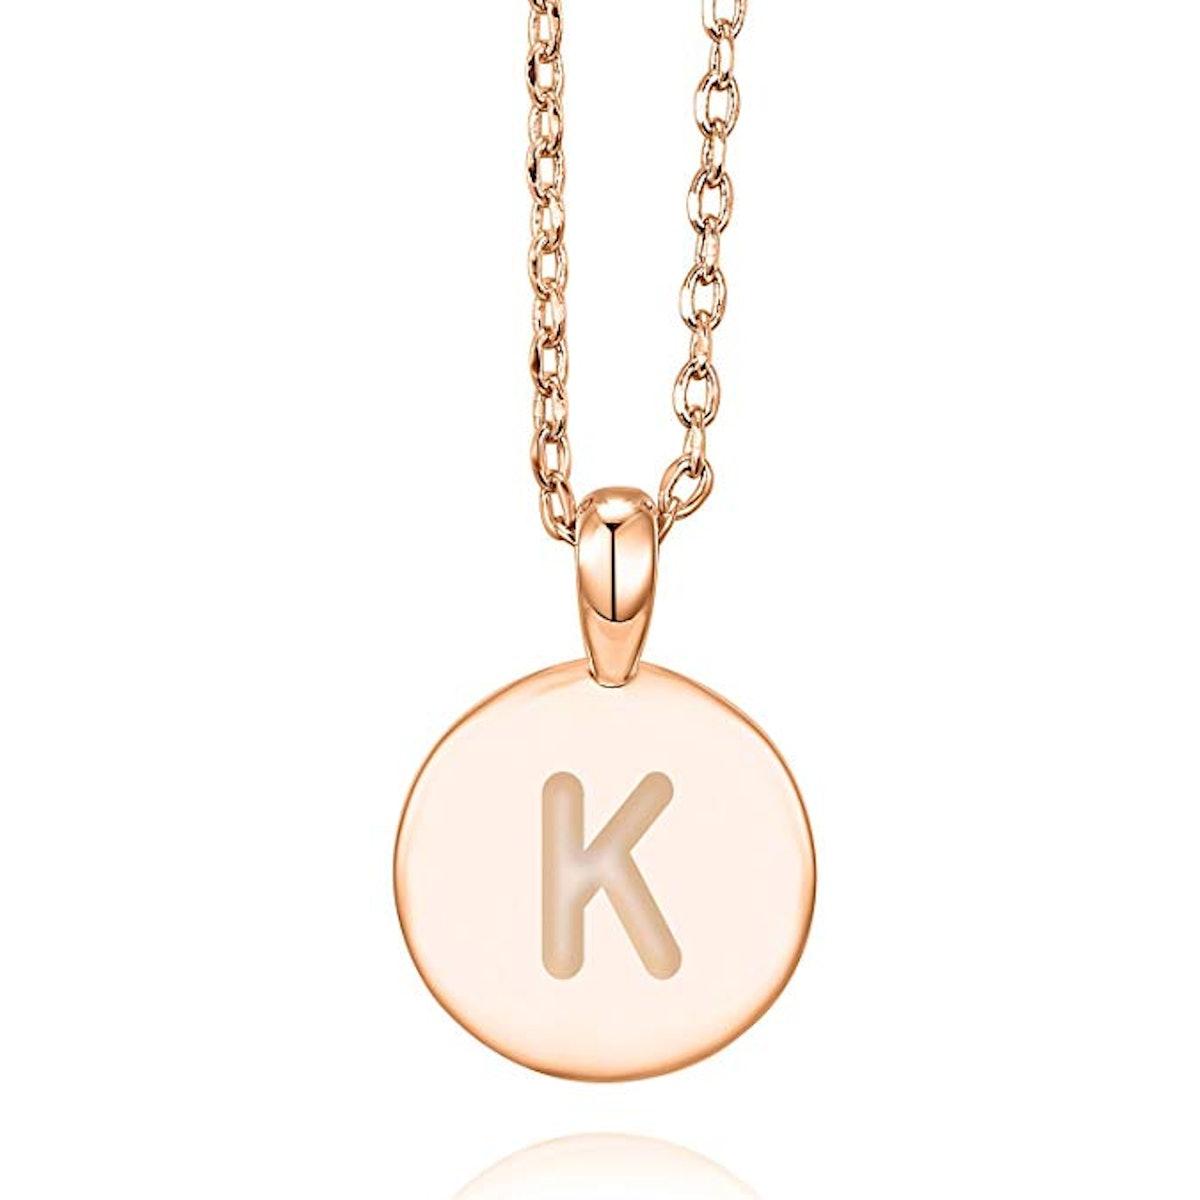 PAVOI 14K Rose Gold Letter Necklace